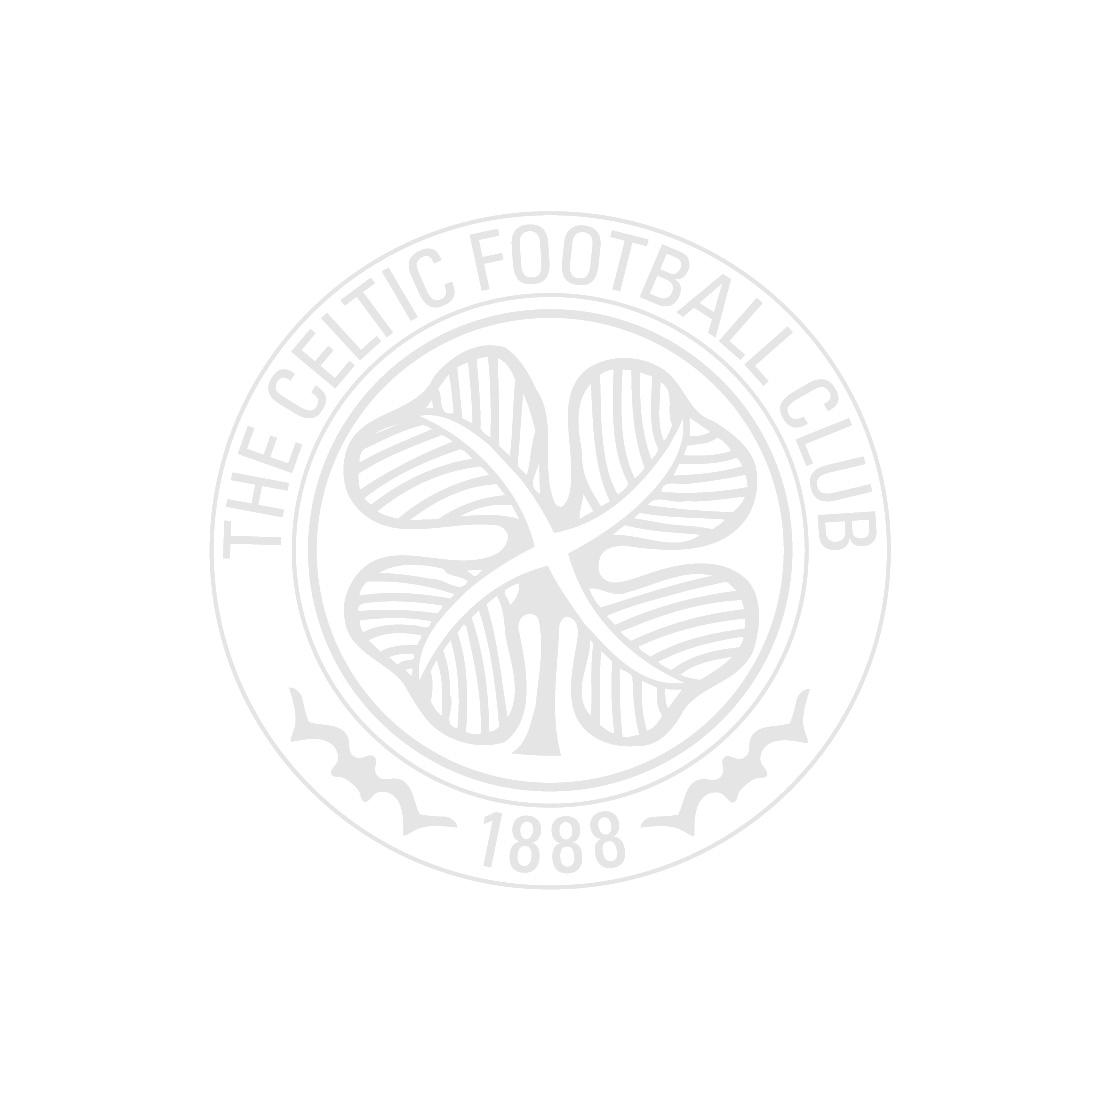 Celtic Scott Sinclair Mug with Signature